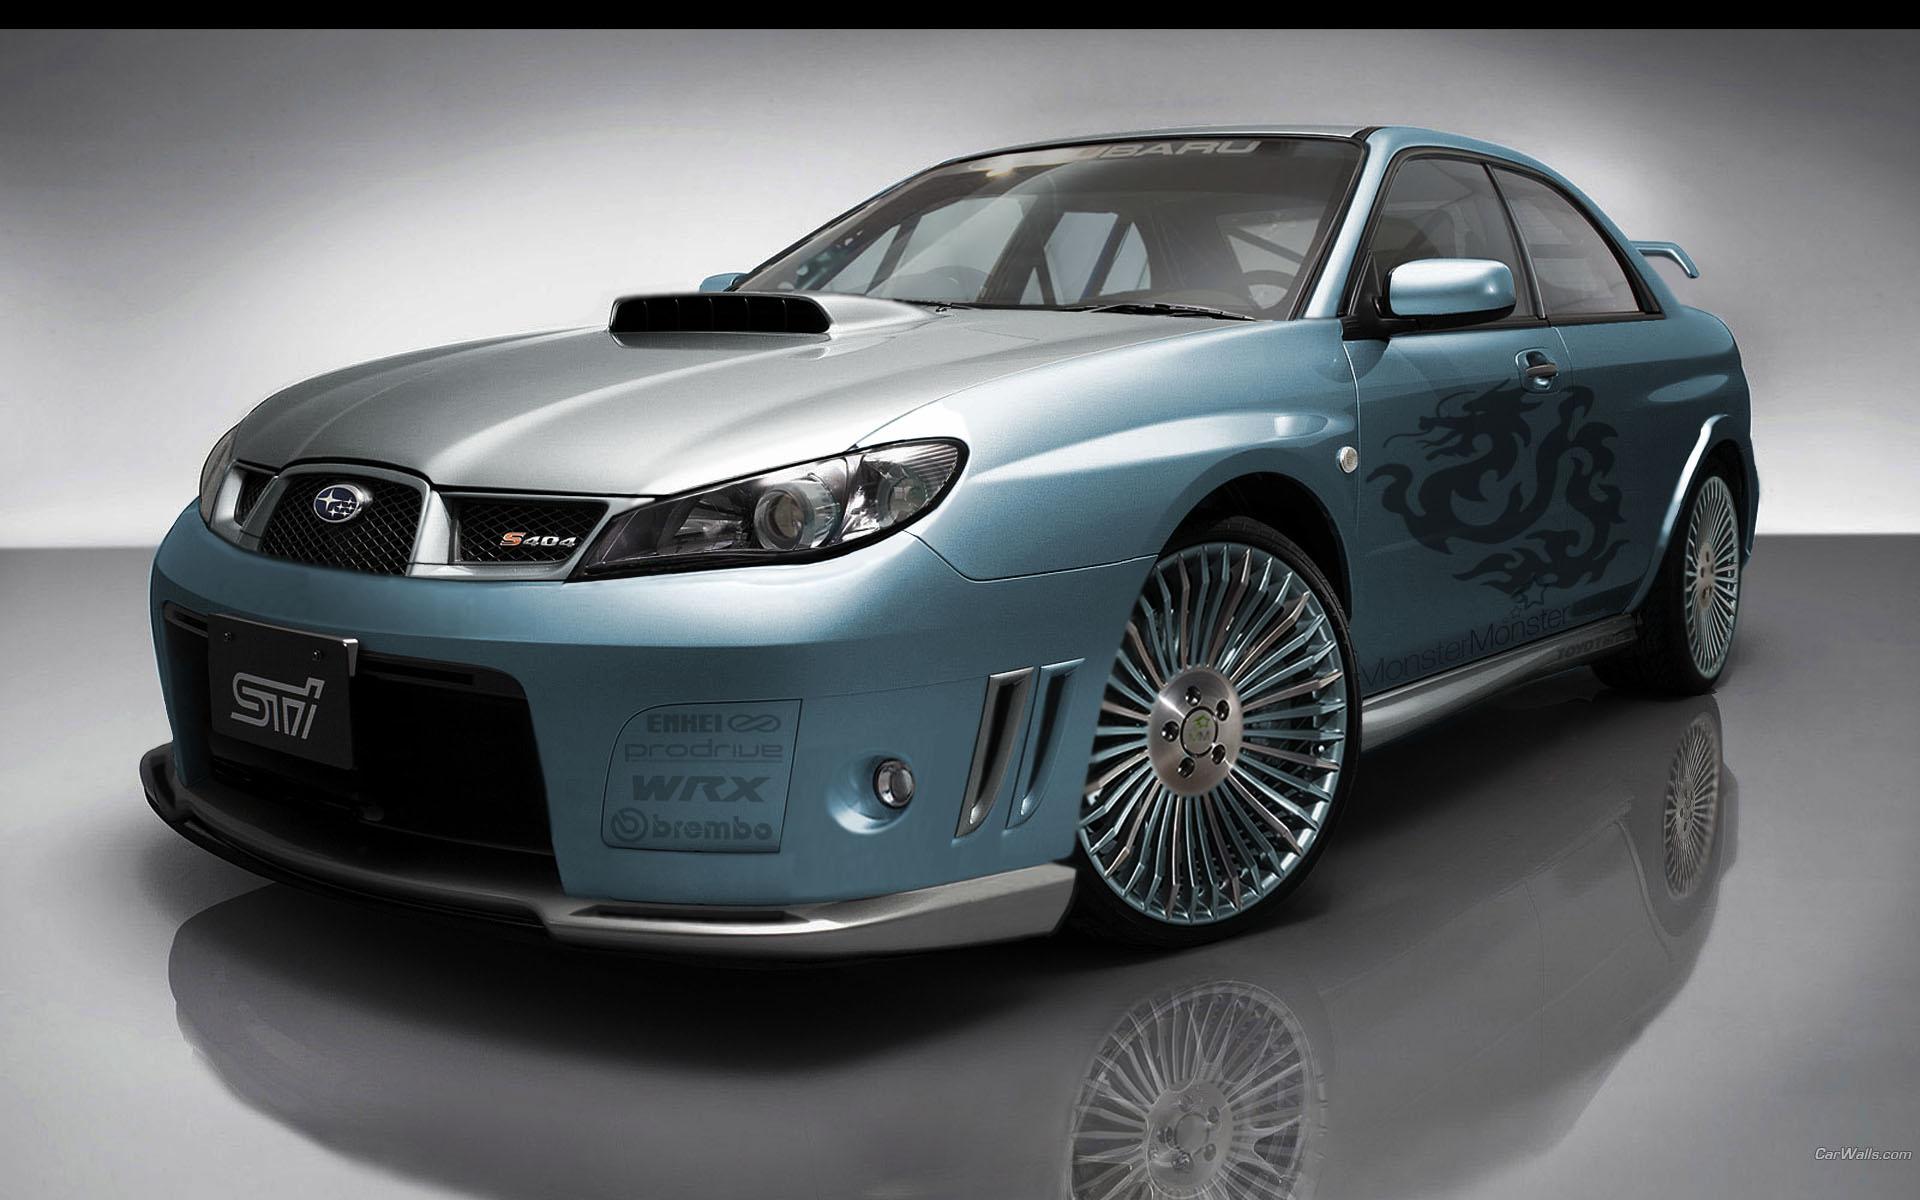 2006 Subaru Impreza By Skaterava On Deviantart